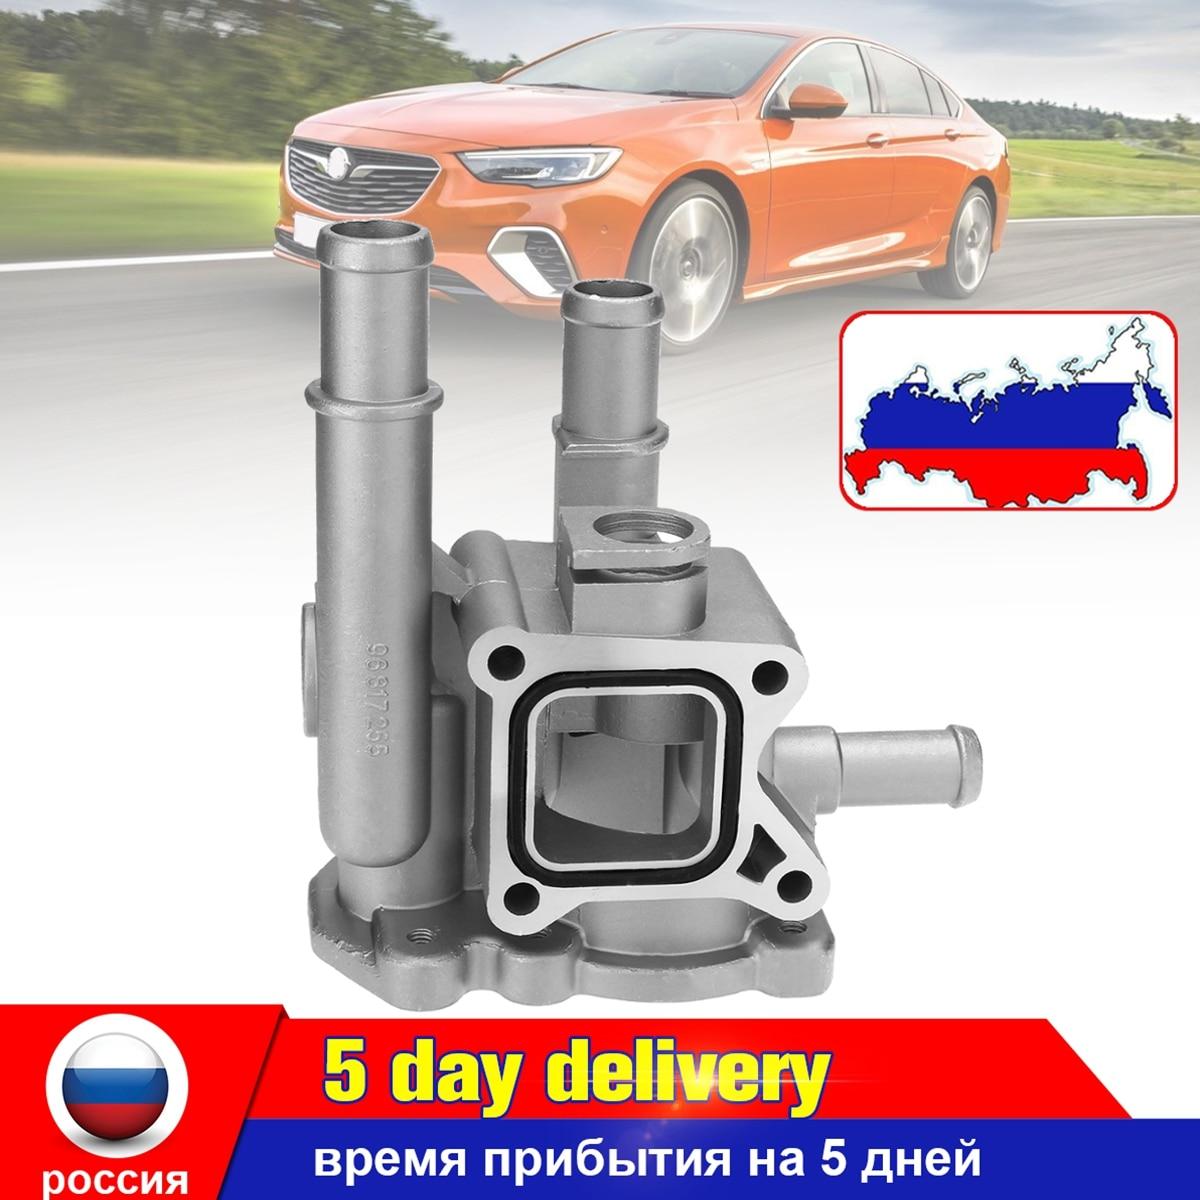 Aluminio refrigerante del motor termostato con carcasa para Chevy Chevrolet Cruze Orlando Astra Zafira 96984103 96817255 96984104